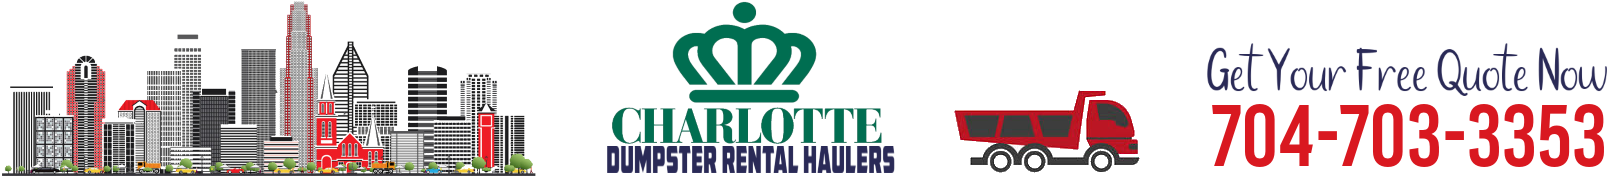 Charlotte Dumpster Rental Haulers